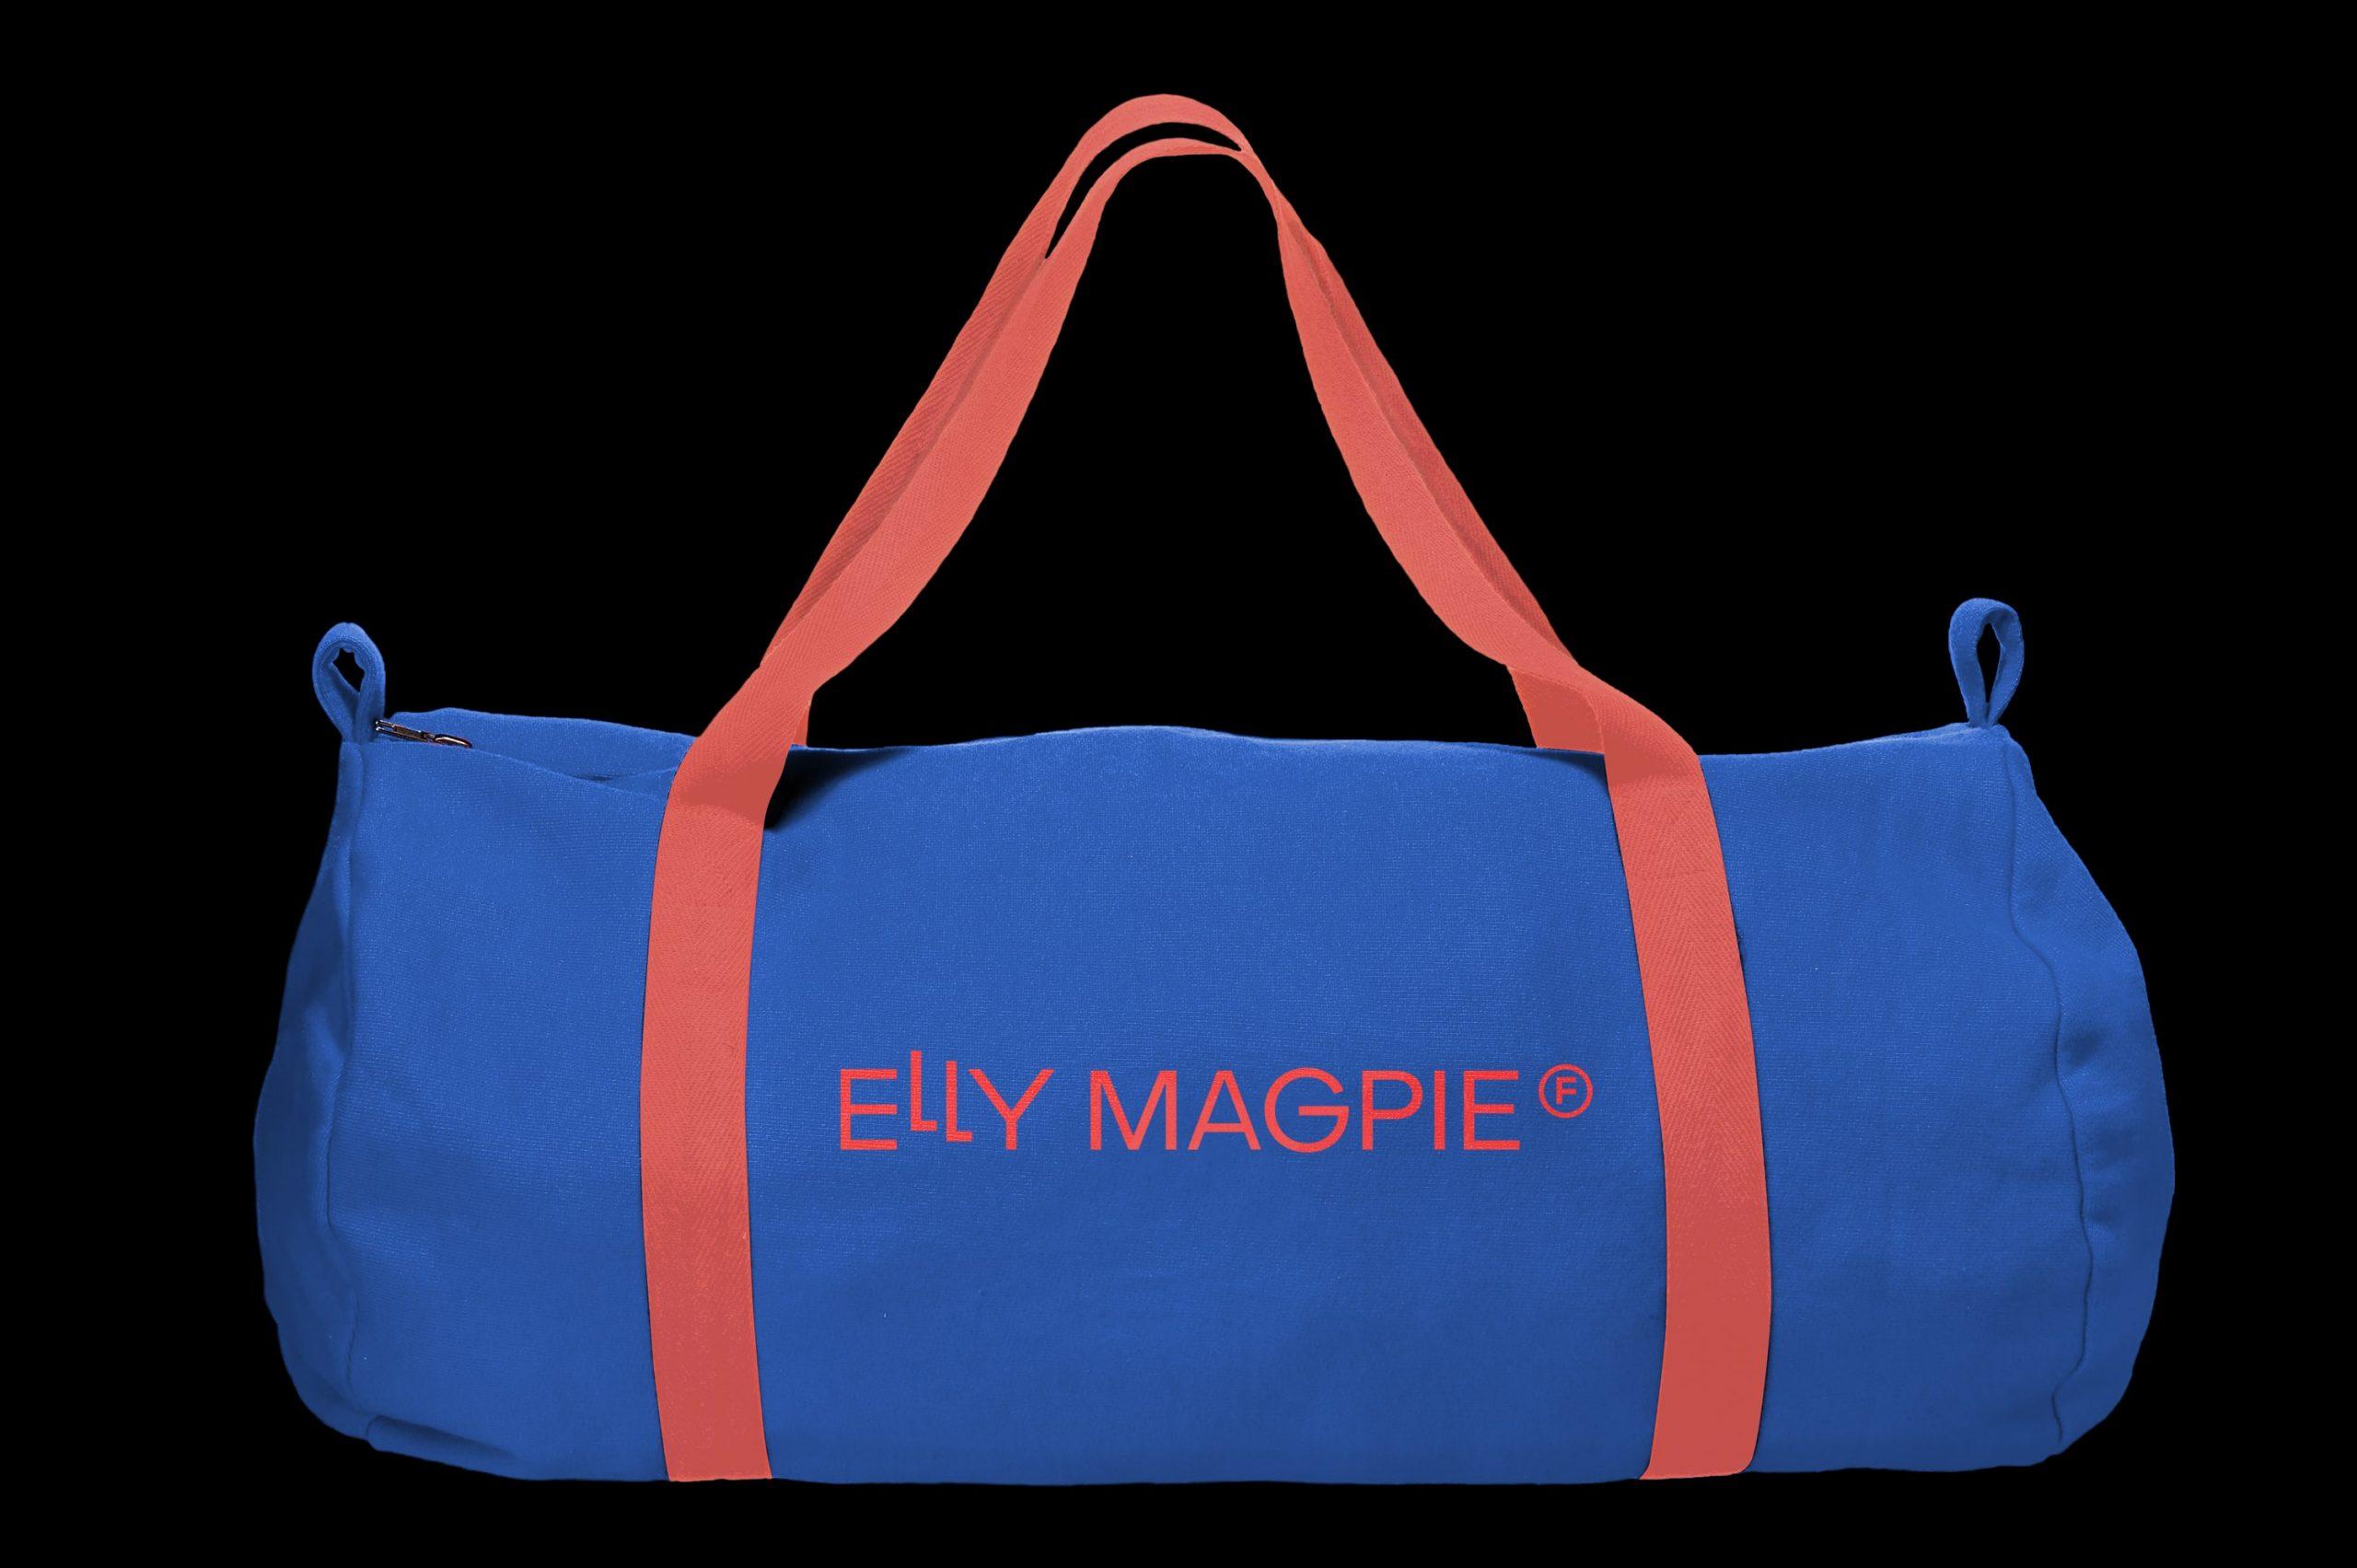 EM_shutterstock_262376465_bluebag-min